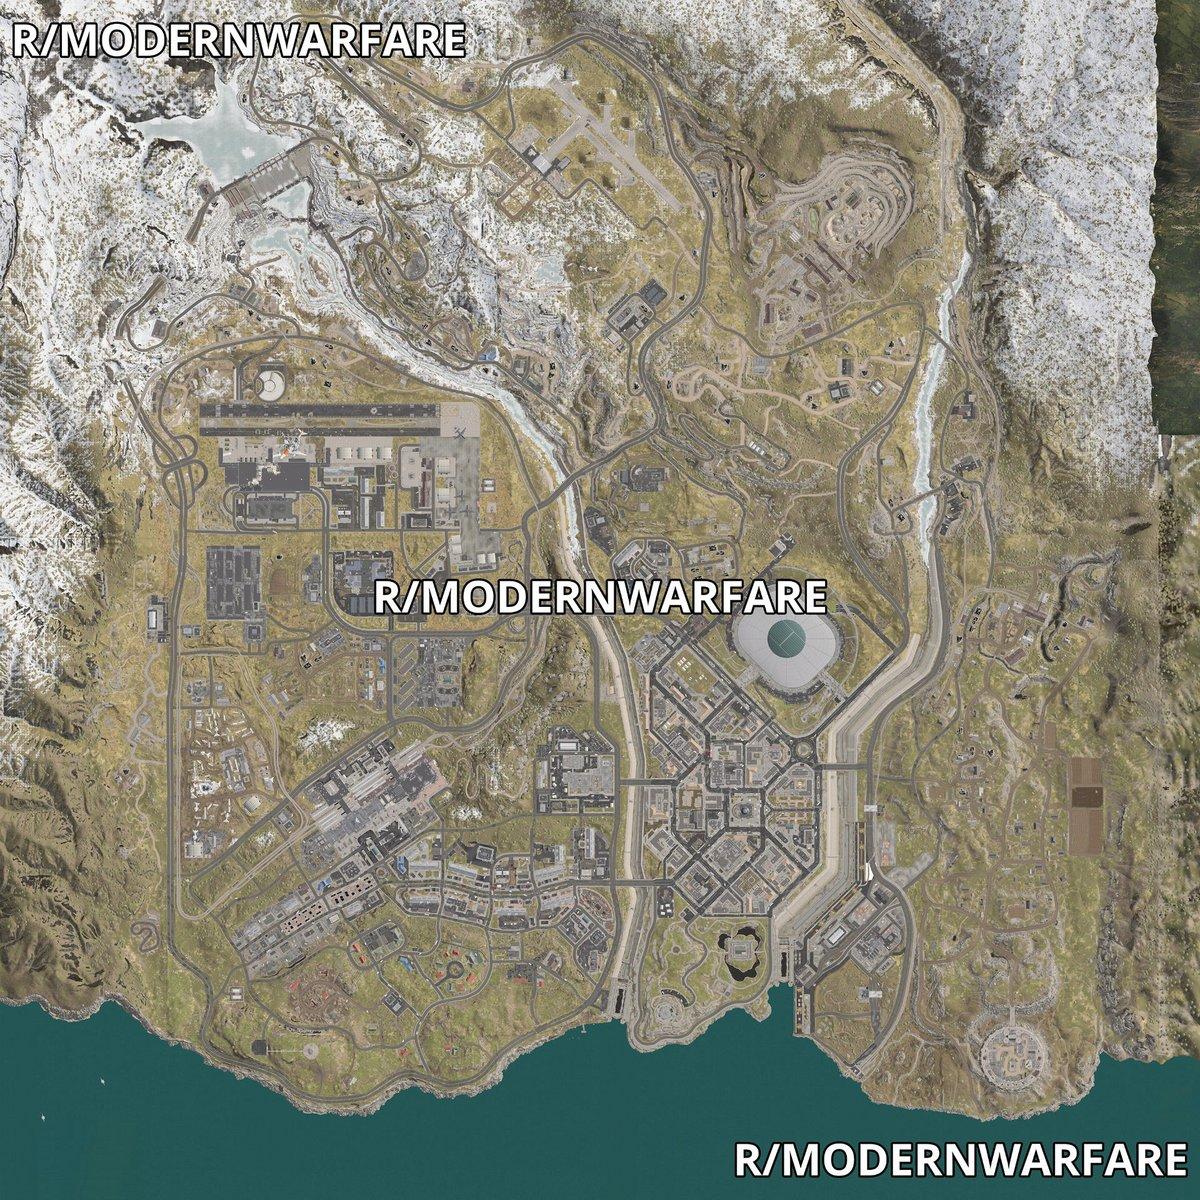 Call of Duty Modern Warfare battle royale map